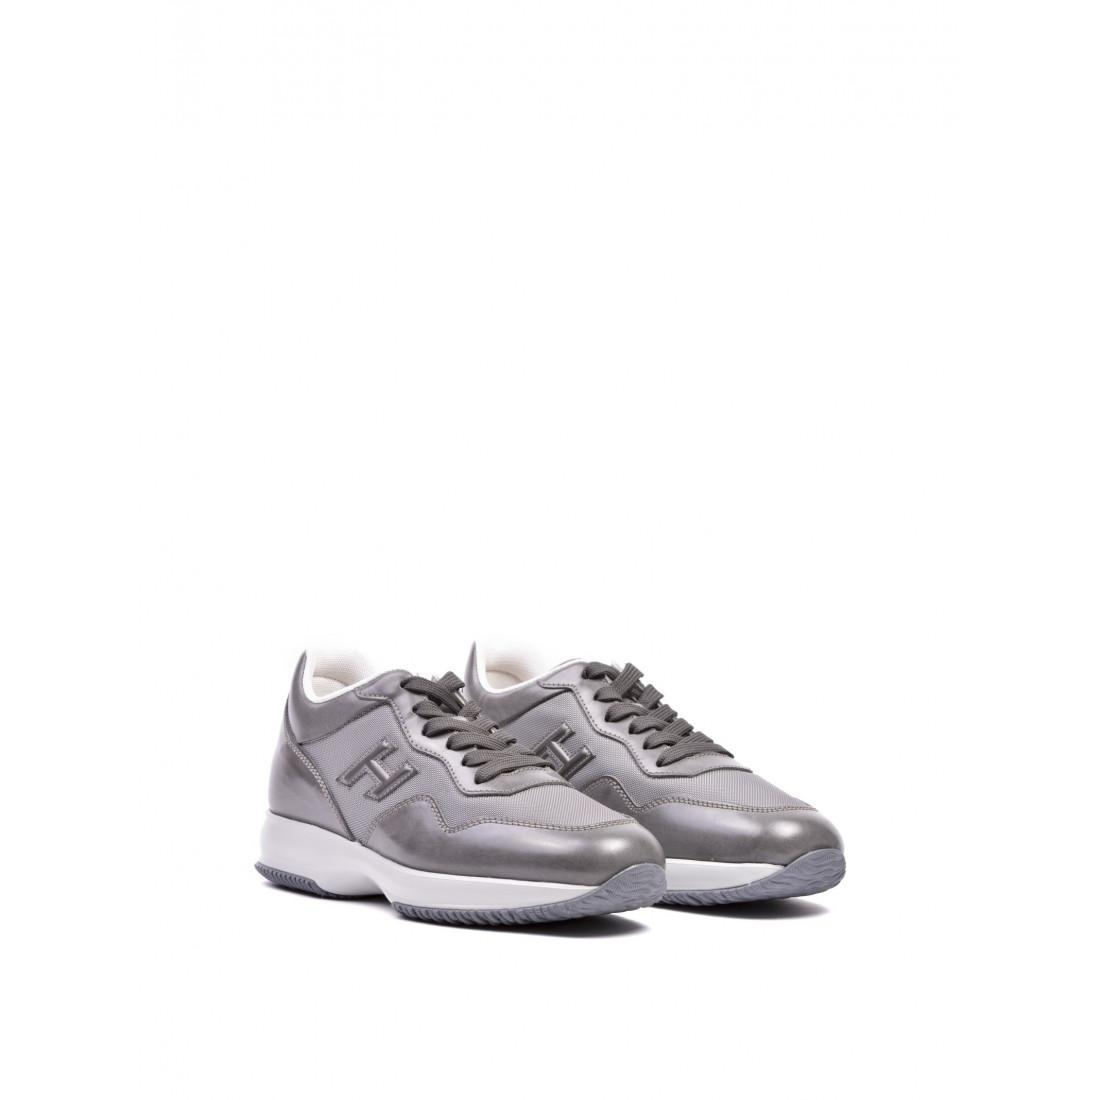 sneakers man hogan hxm00n0u0405zf4633